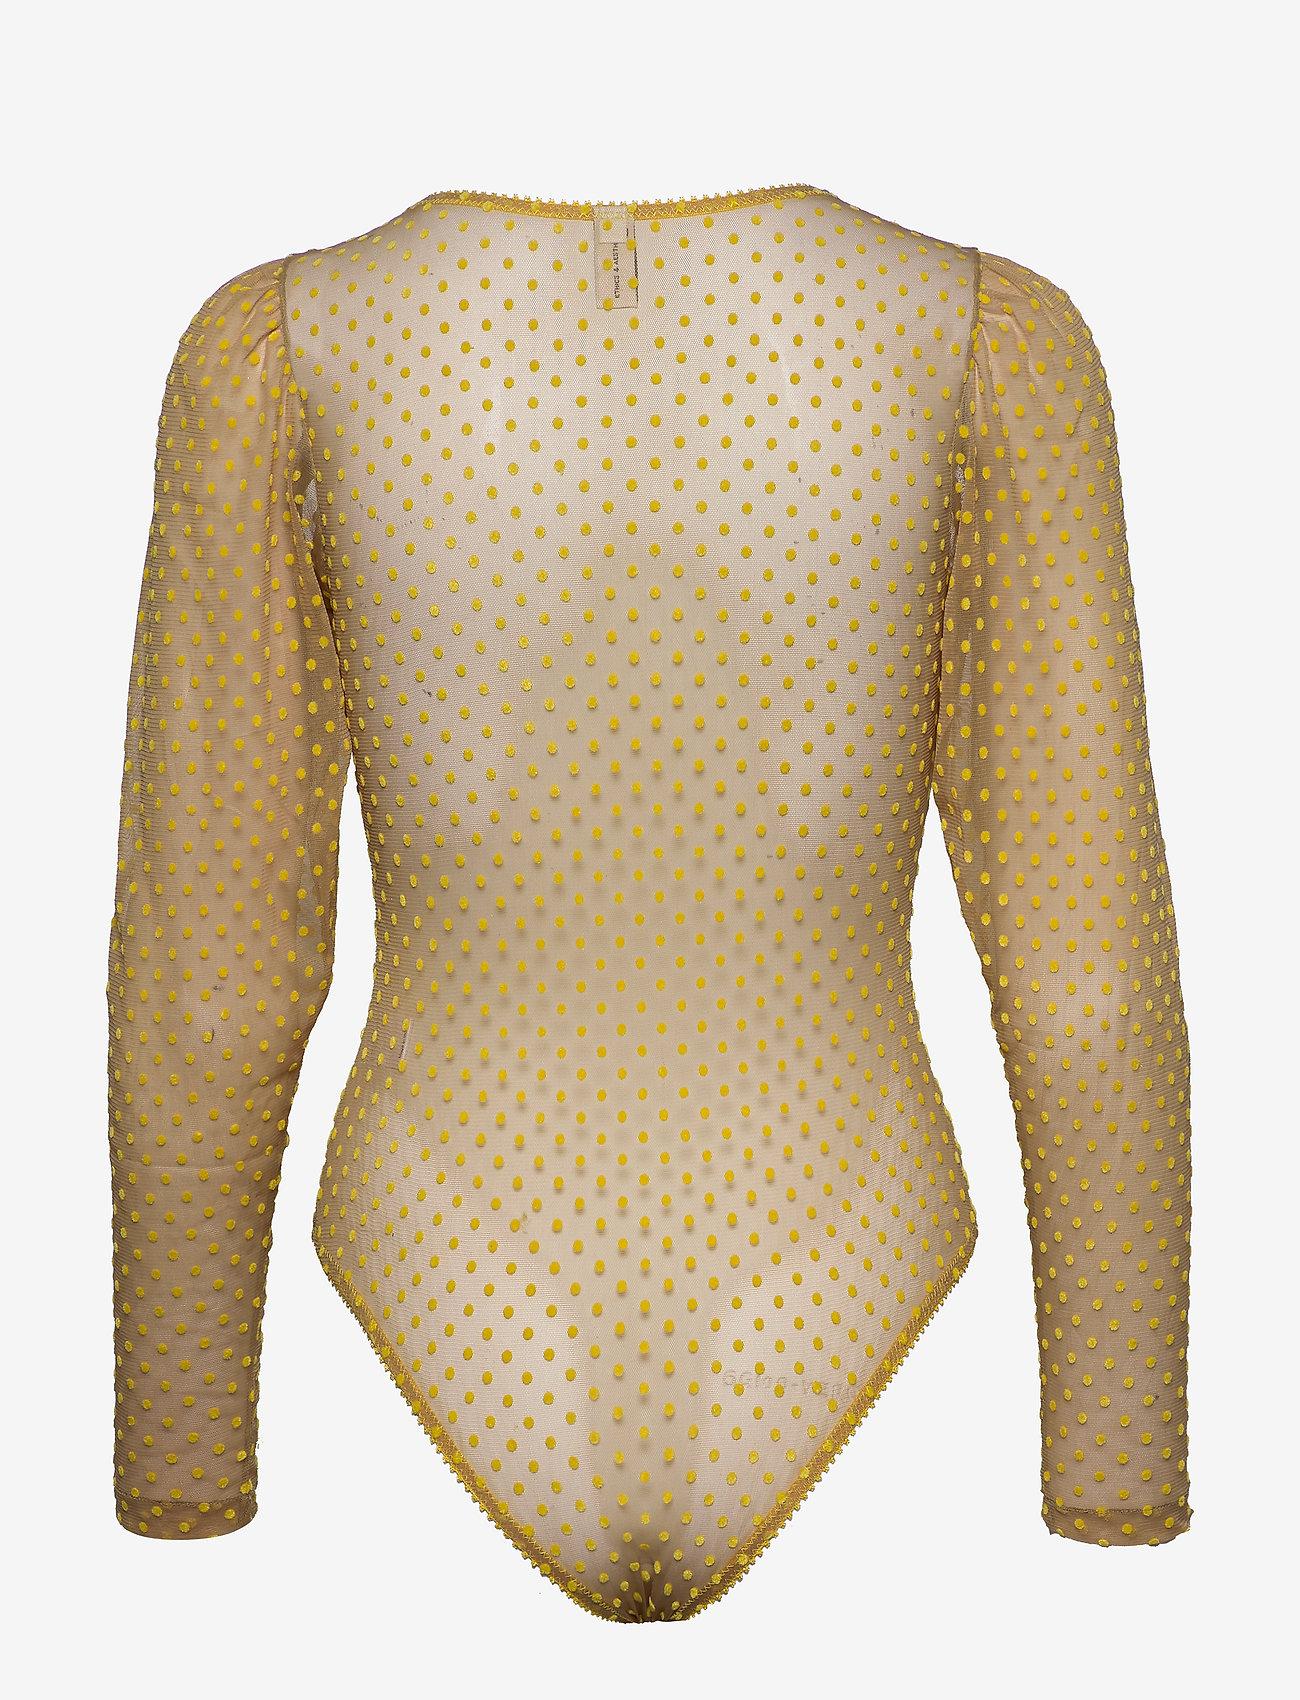 Underprotection - Donna bodystocking - bodies & slips - yellow - 1